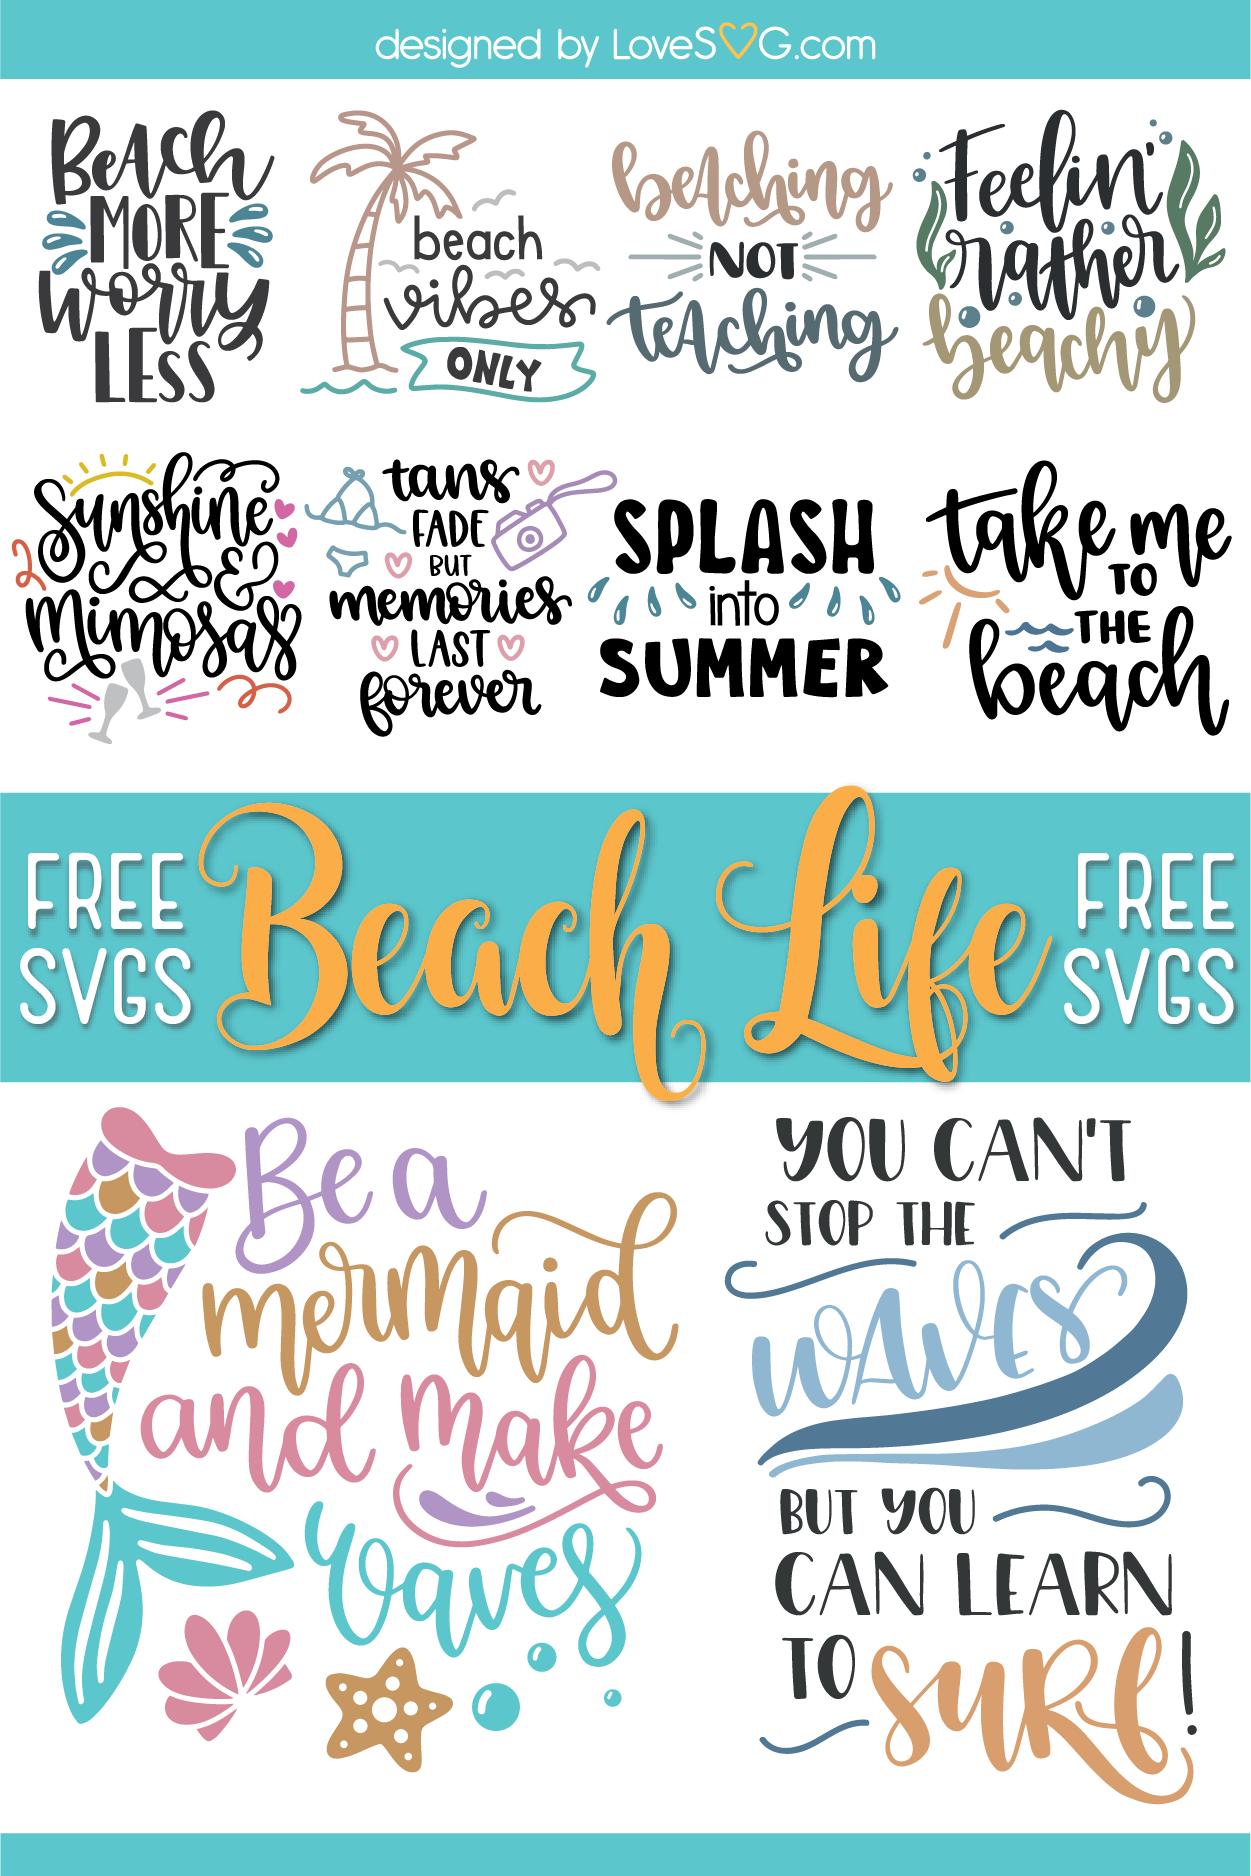 Download Pin on Free Summer SVG Cut File | LoveSVG.com